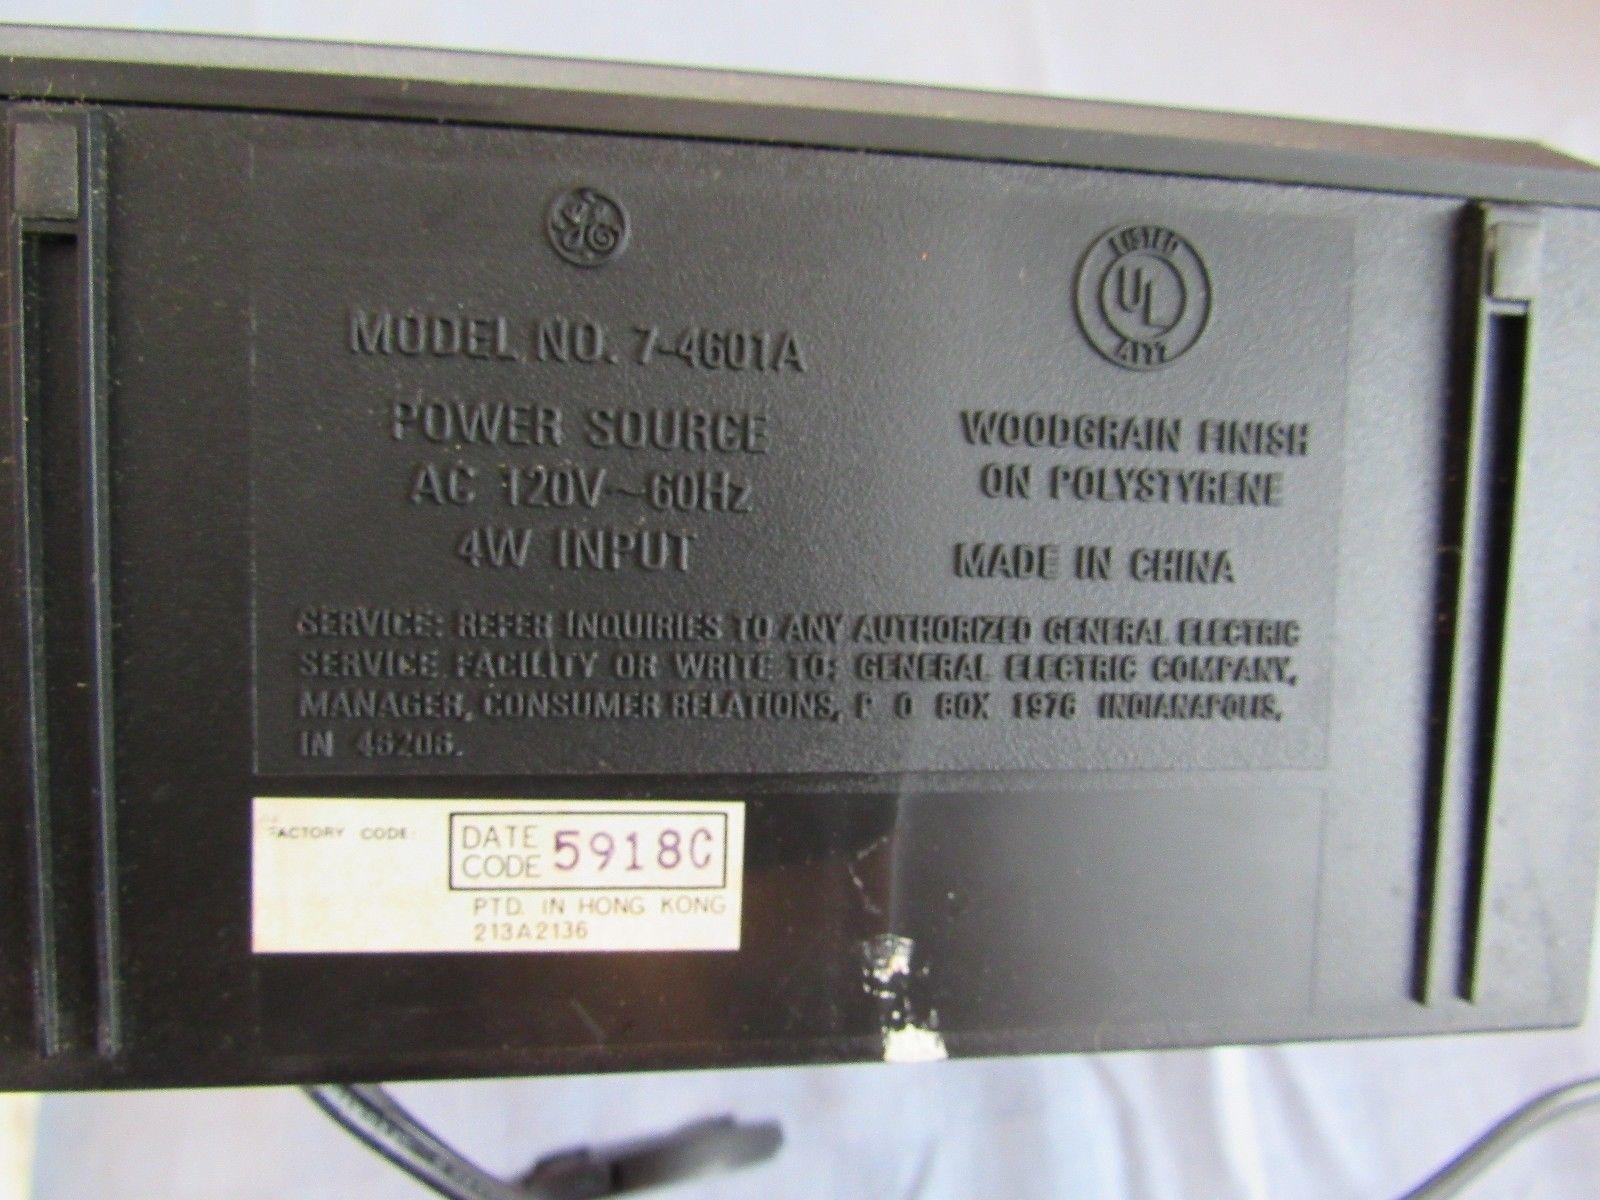 Vintage General Electric Alarm Clock AM/FM Radio 7-4601A with Manual